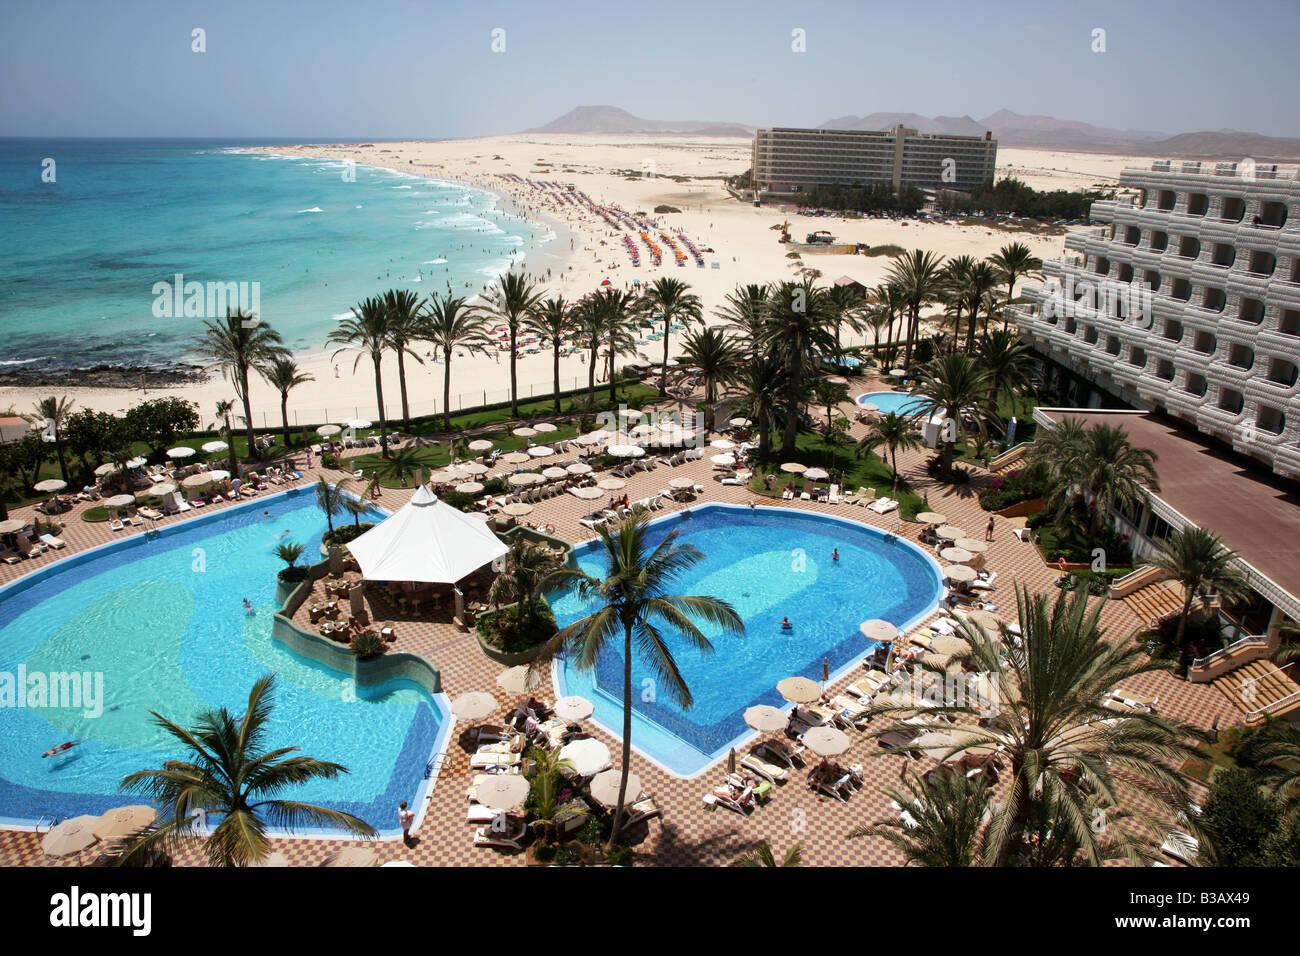 Spain Canary Islands Fuerteventura Ocean